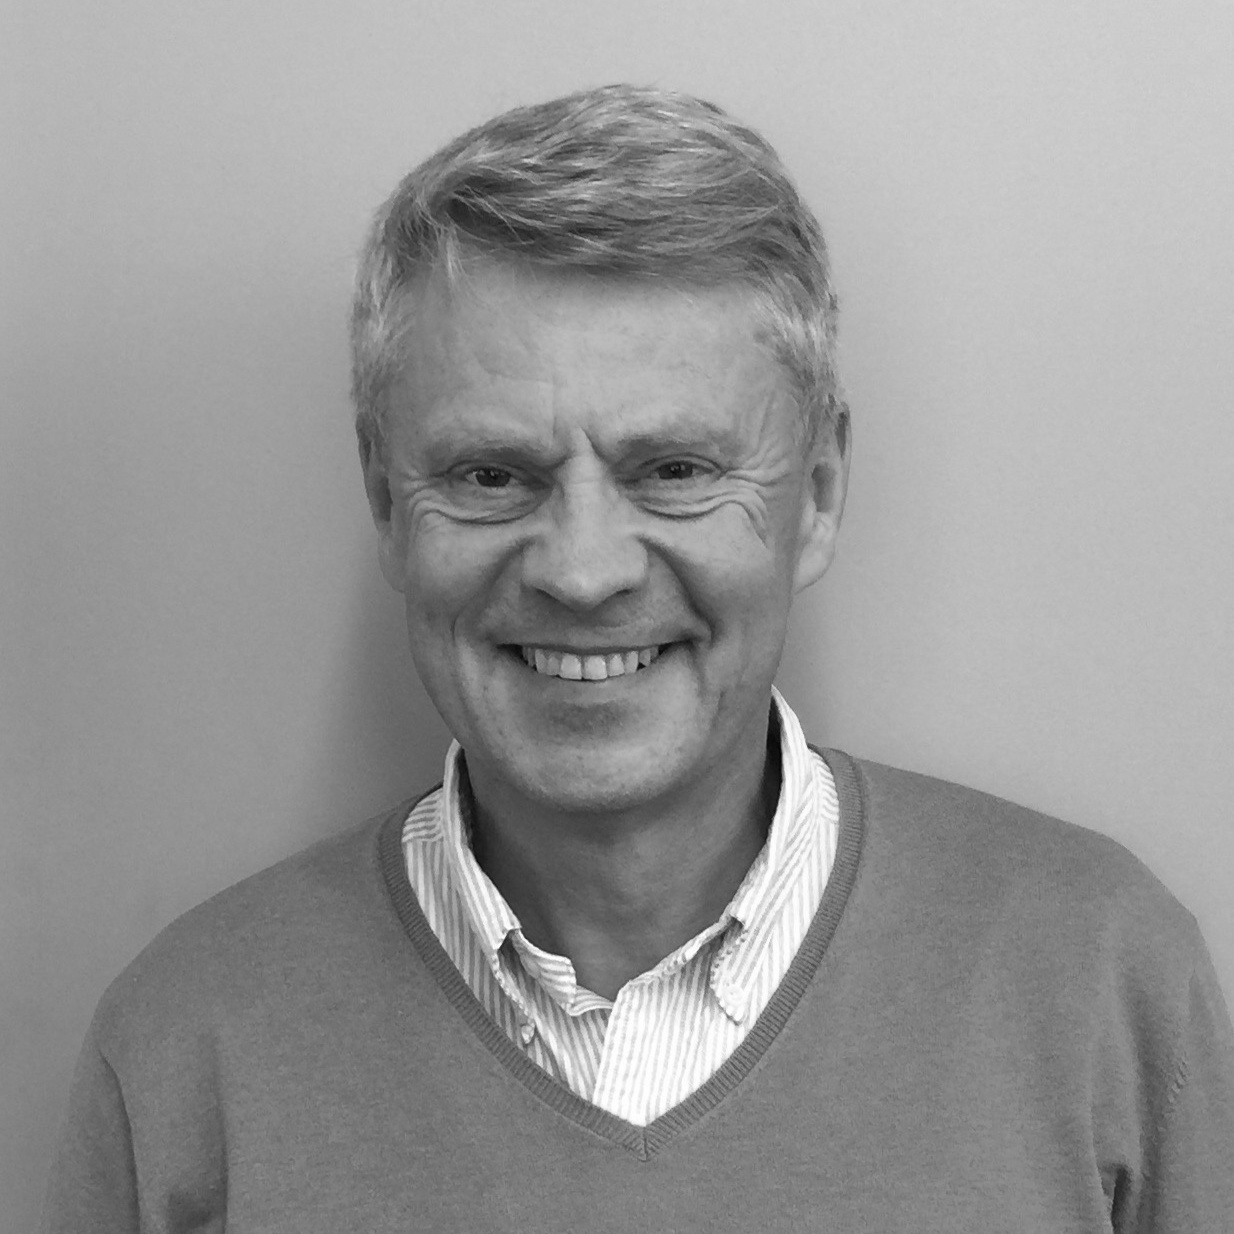 Jan M. Bjordal (KYGO)